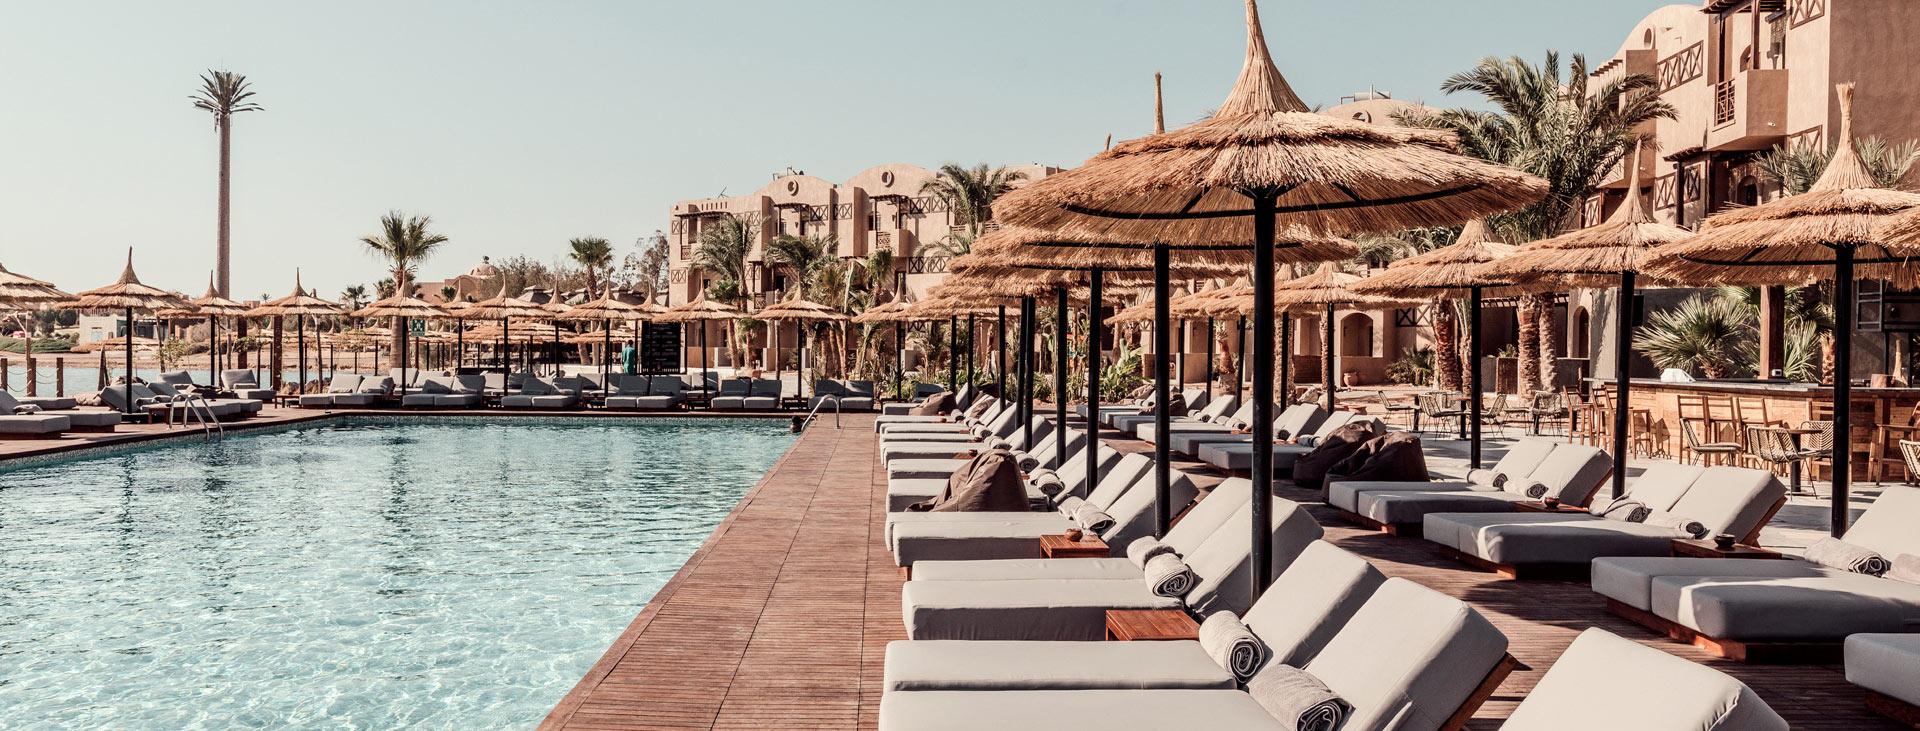 Cook's Club El Gouna, El Gouna, Hurghada-området, Egypten